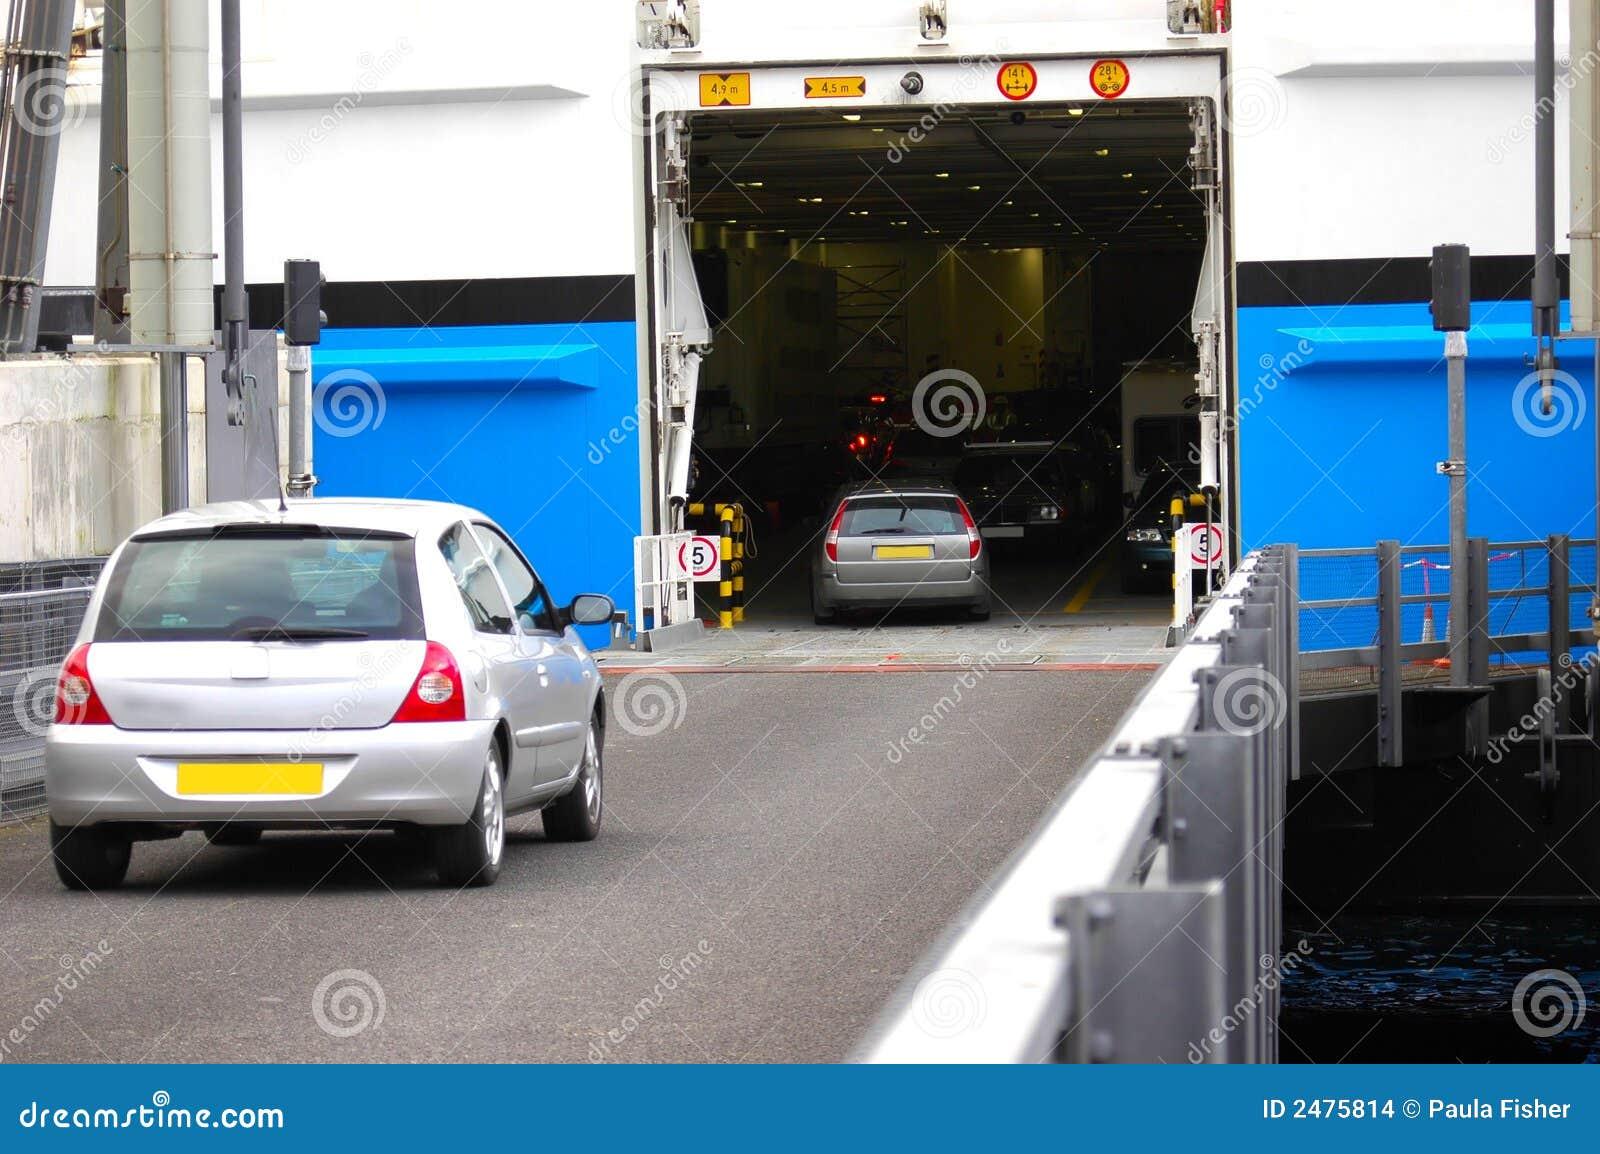 Cars entering ferry deck.